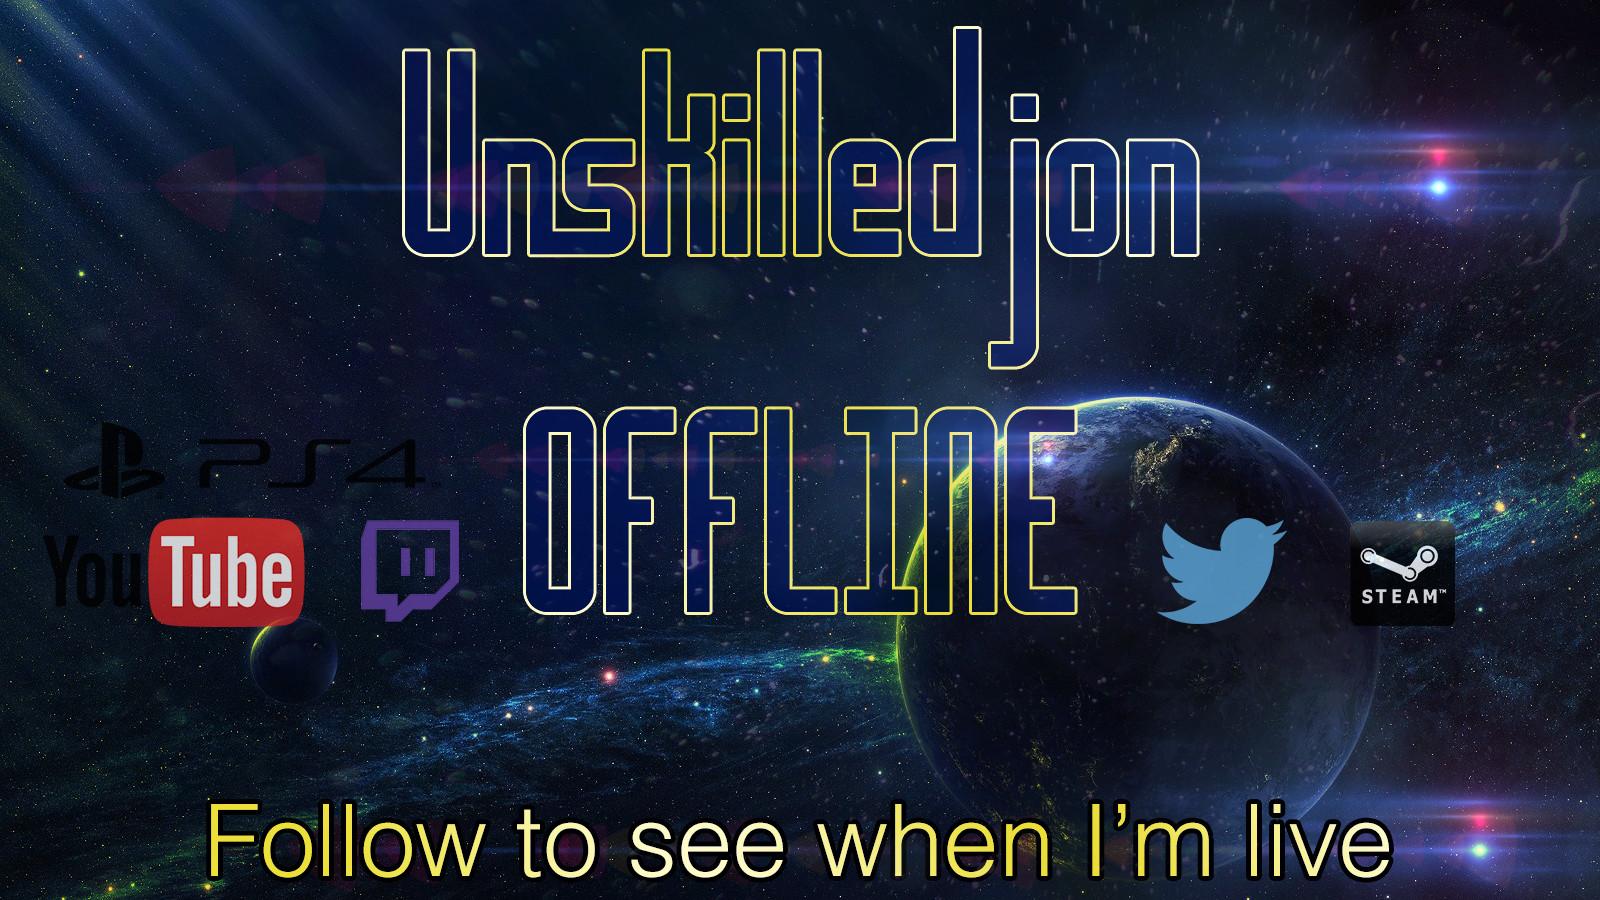 Joe cove offline banner unskilledjon 2